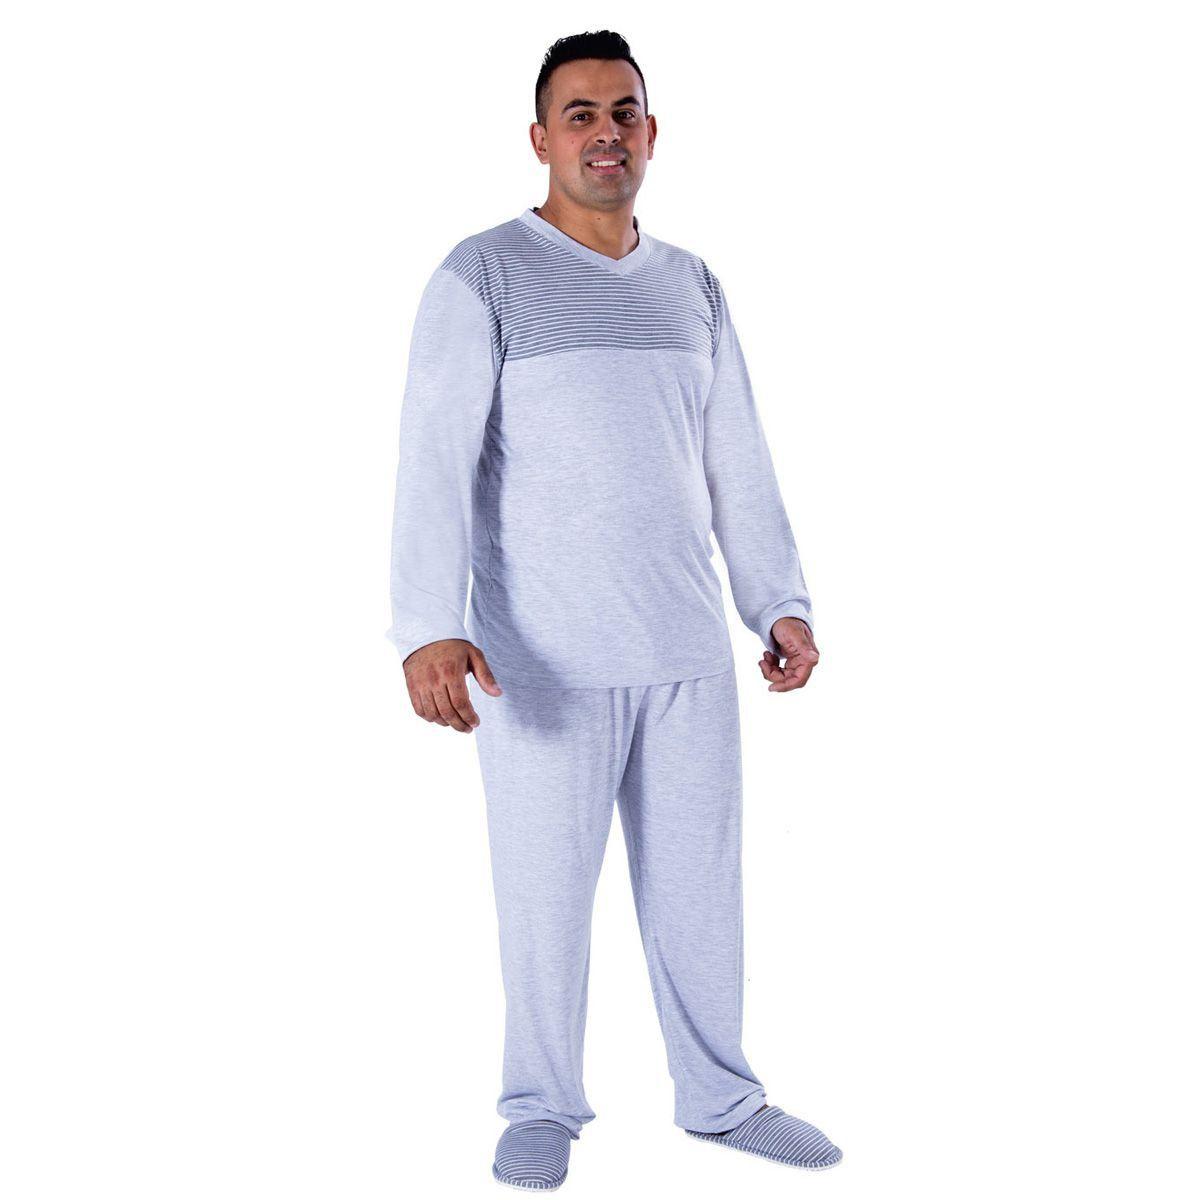 Pijama Masculino Plus size de Inverno com Listras Victory